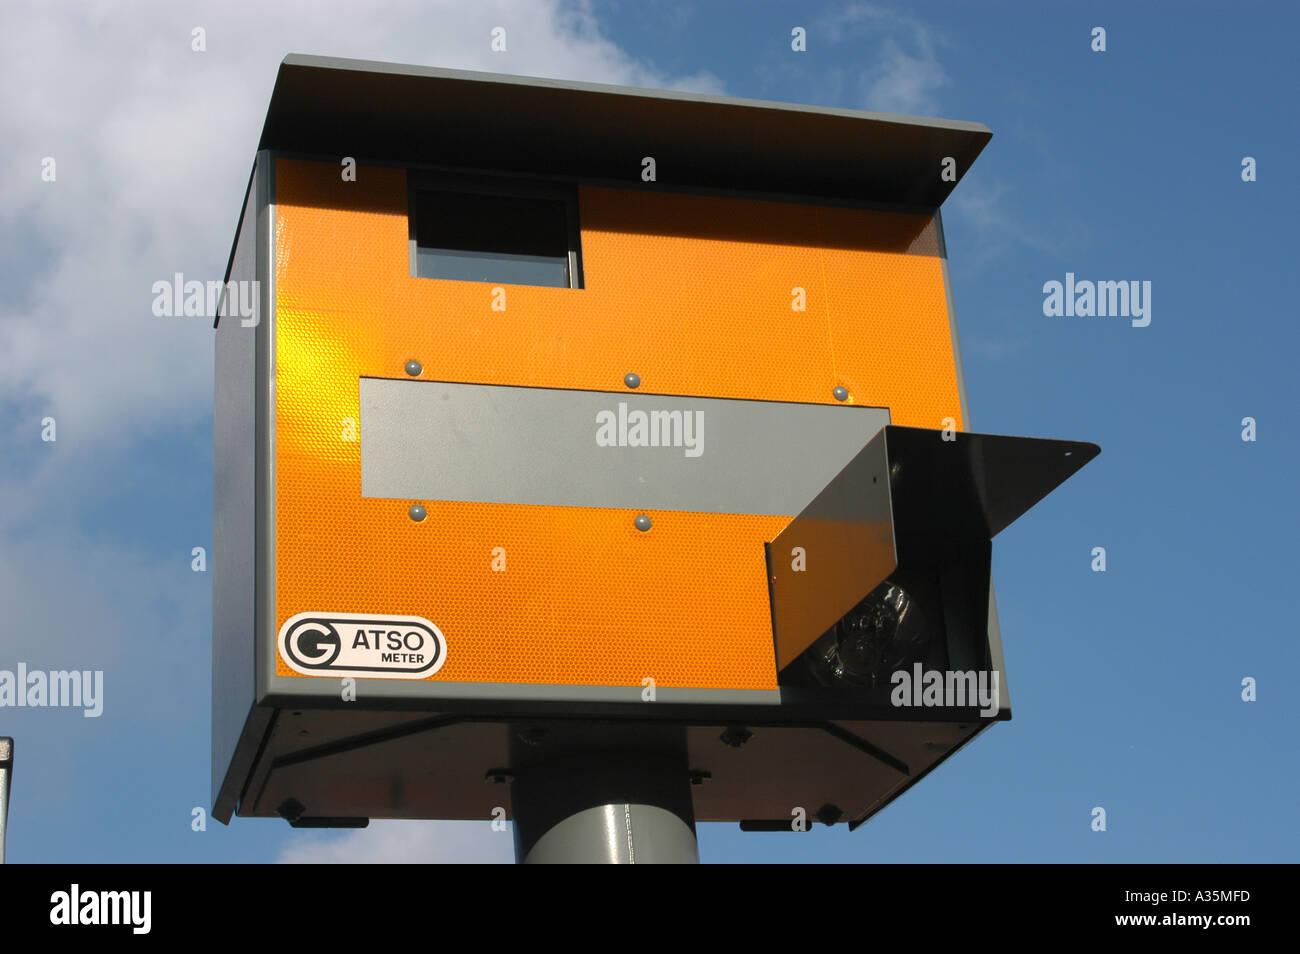 Gatso Speed camera London UK - Stock Image